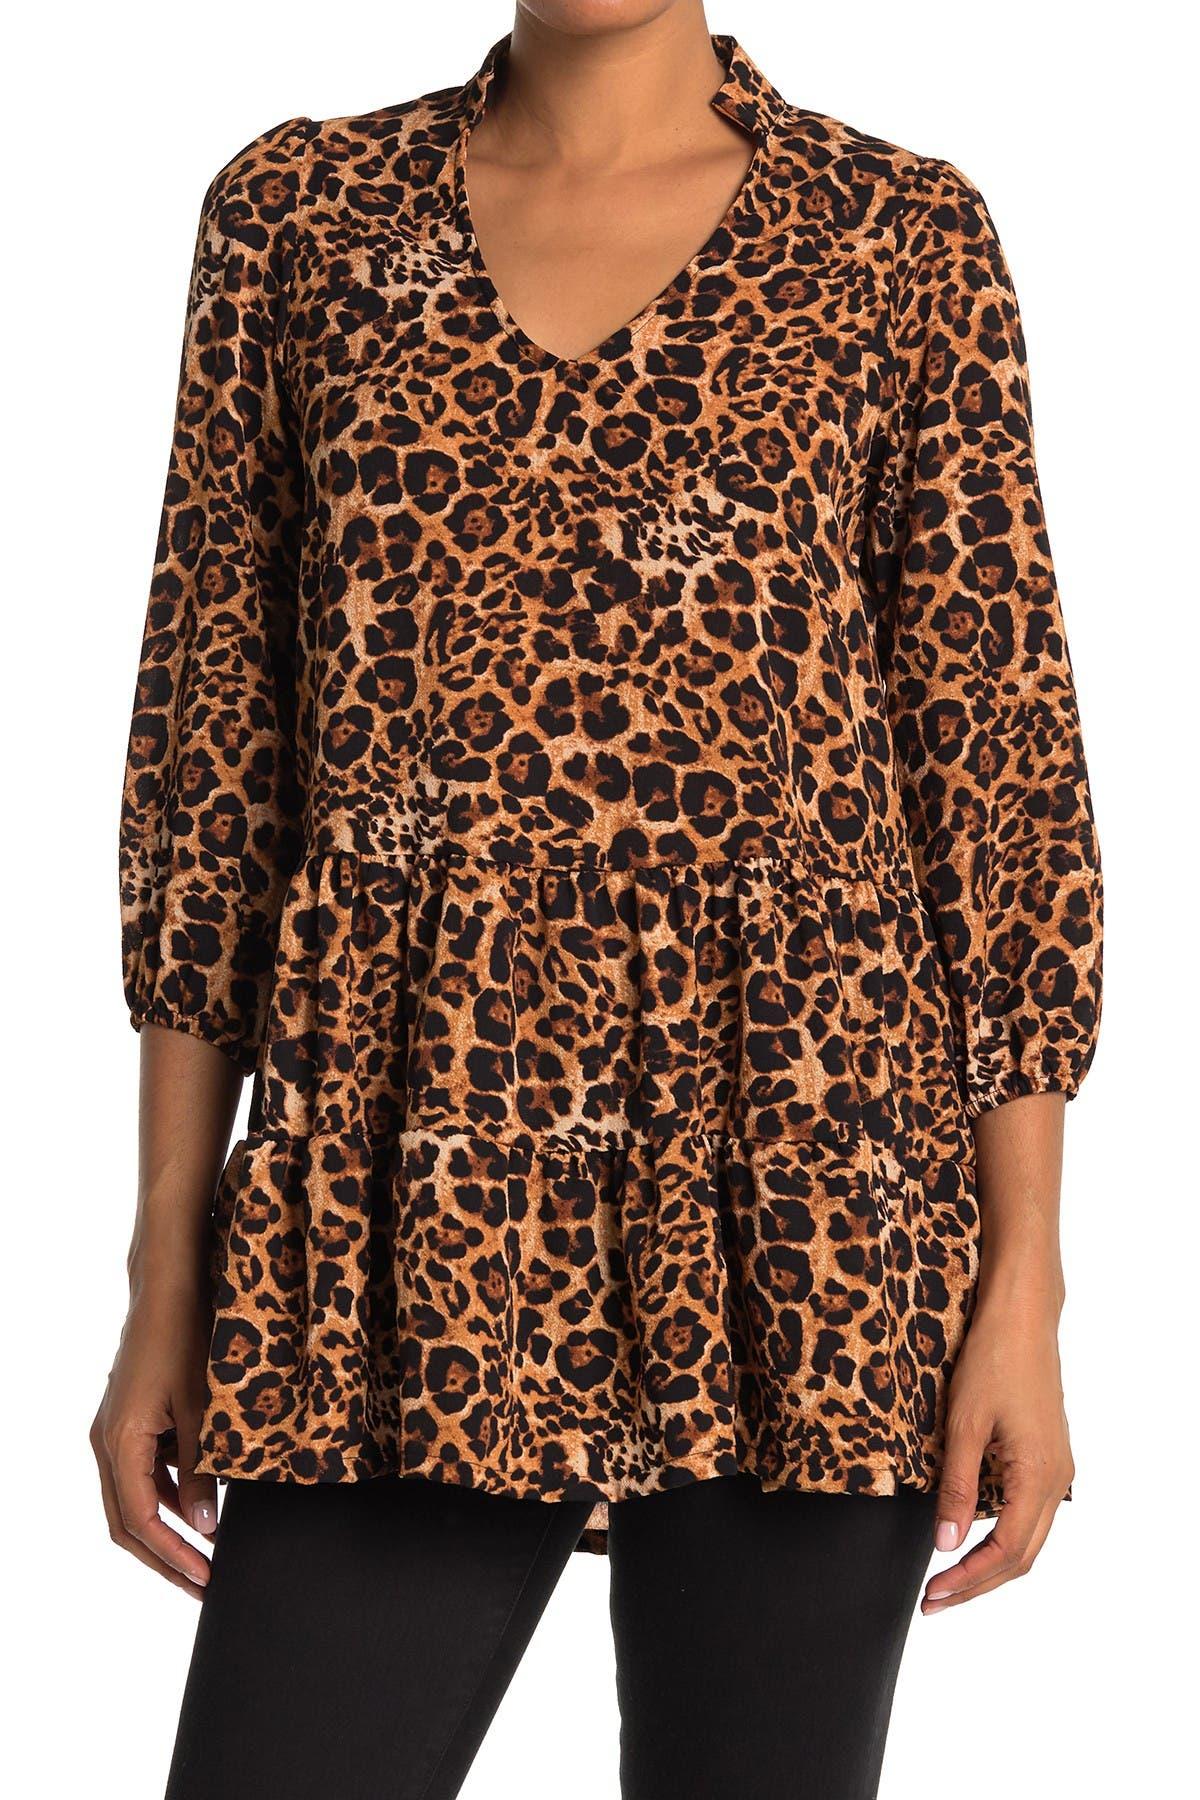 Image of Velvet Torch Tiered Shirt Dress